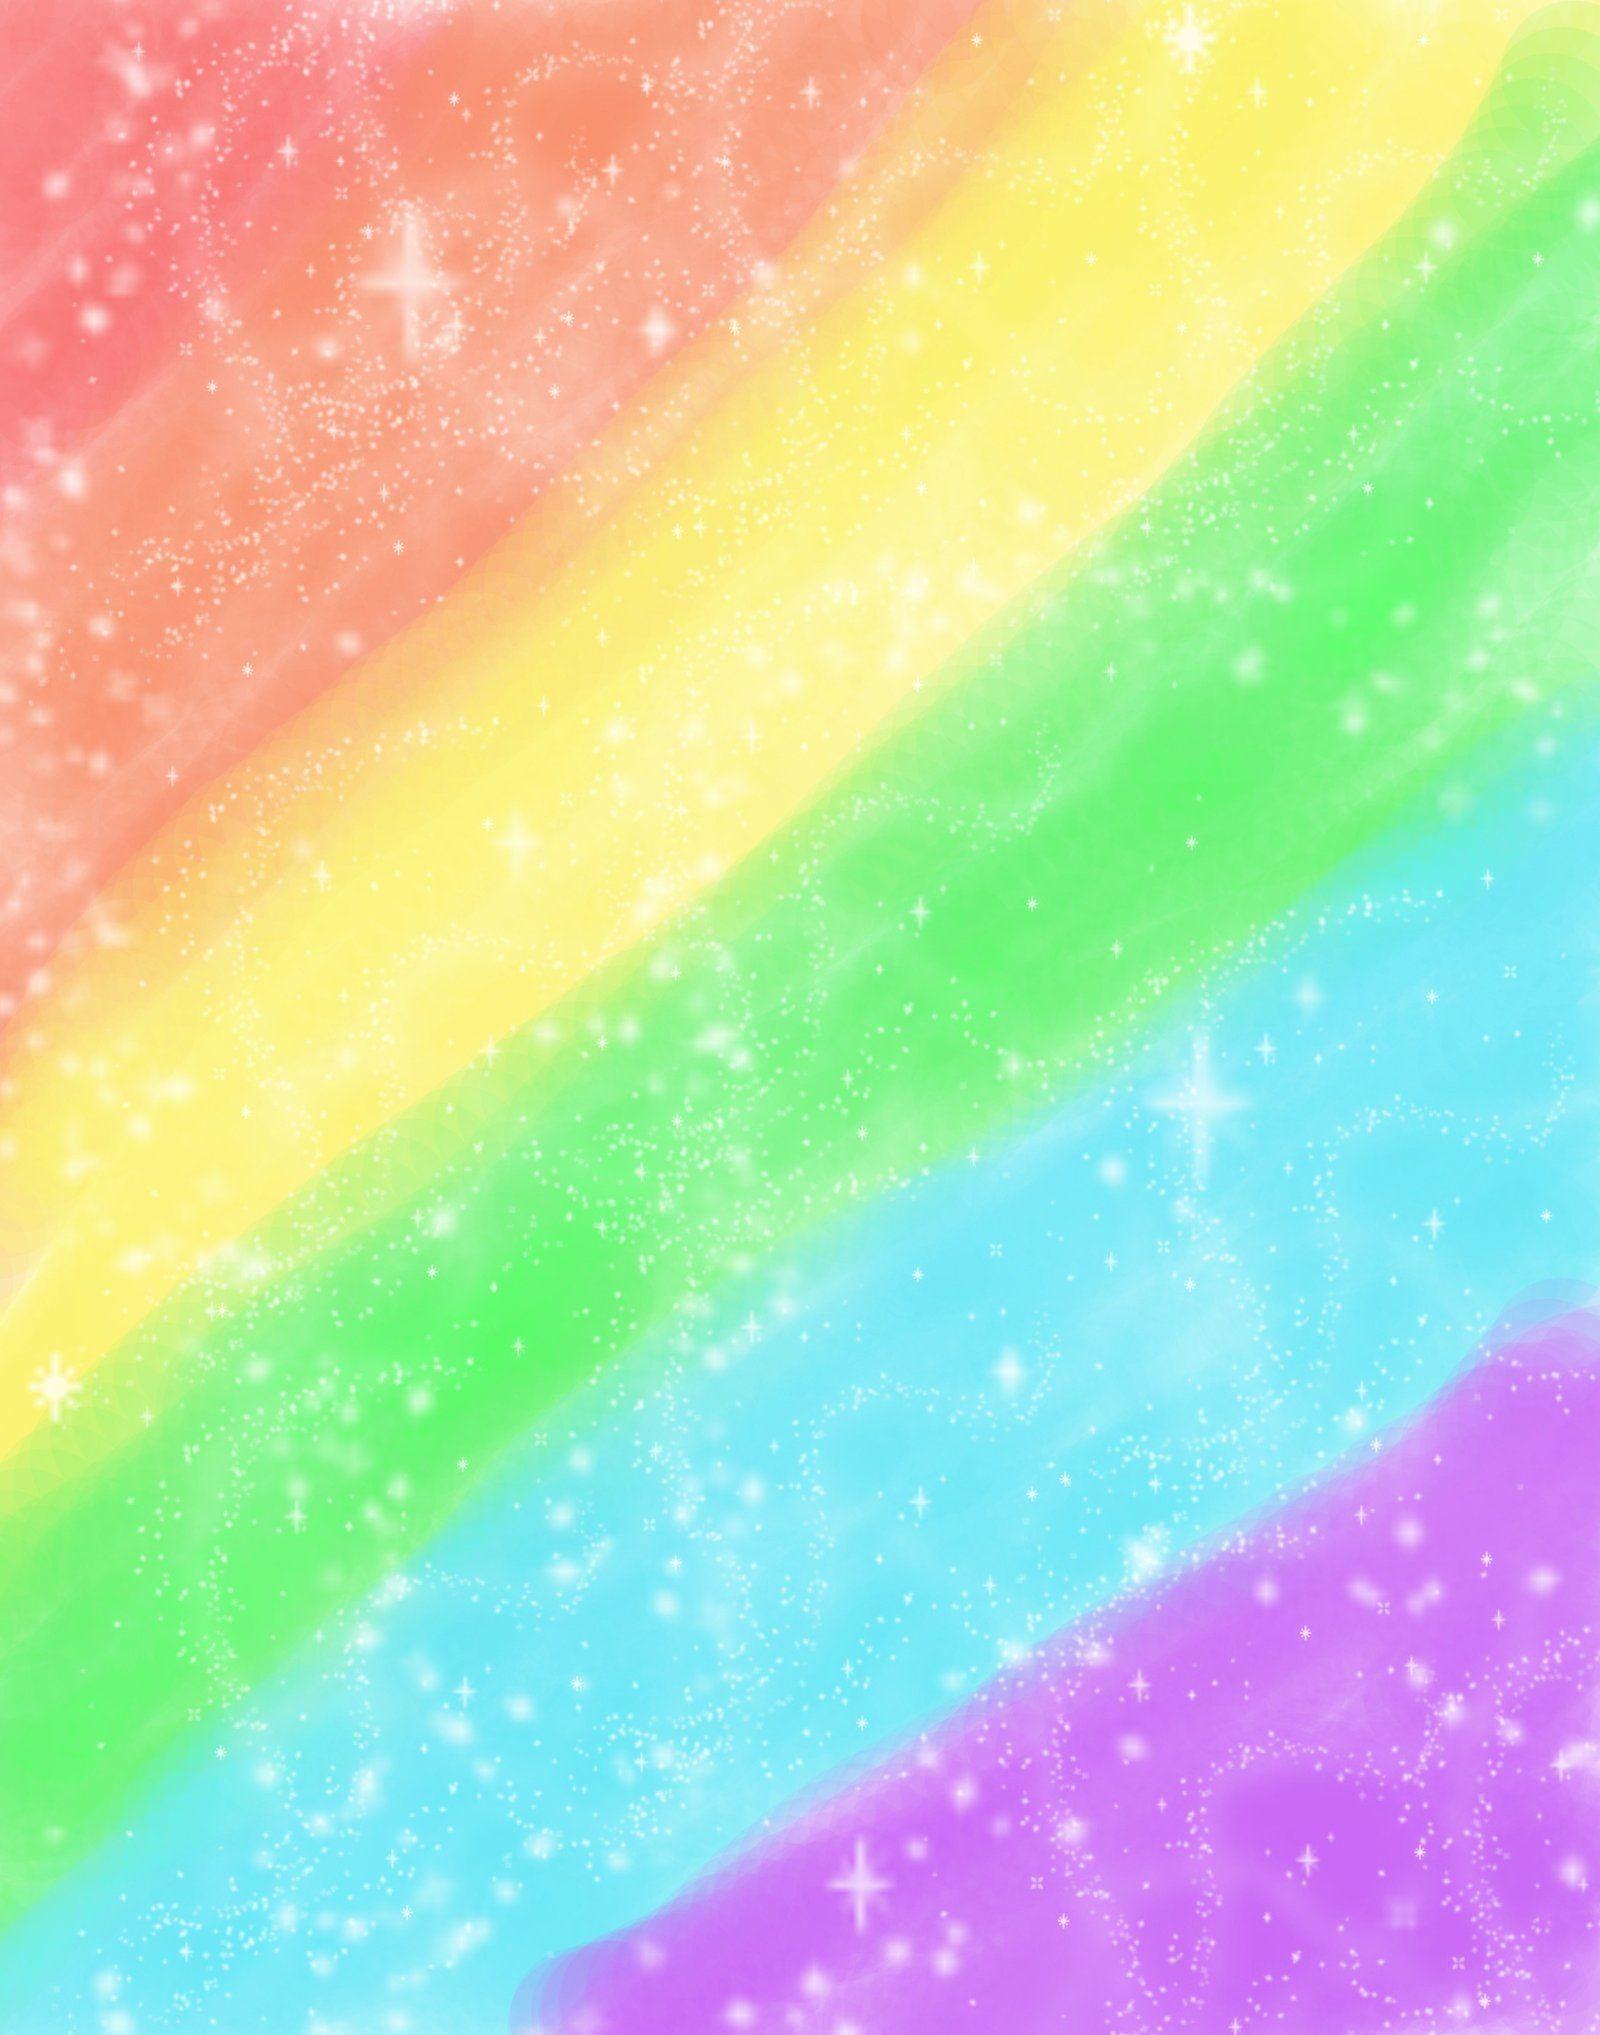 Rainbow iphone wallpaper tumblr - 1600x2035 Download Rainbow Tumblr Wallpapers